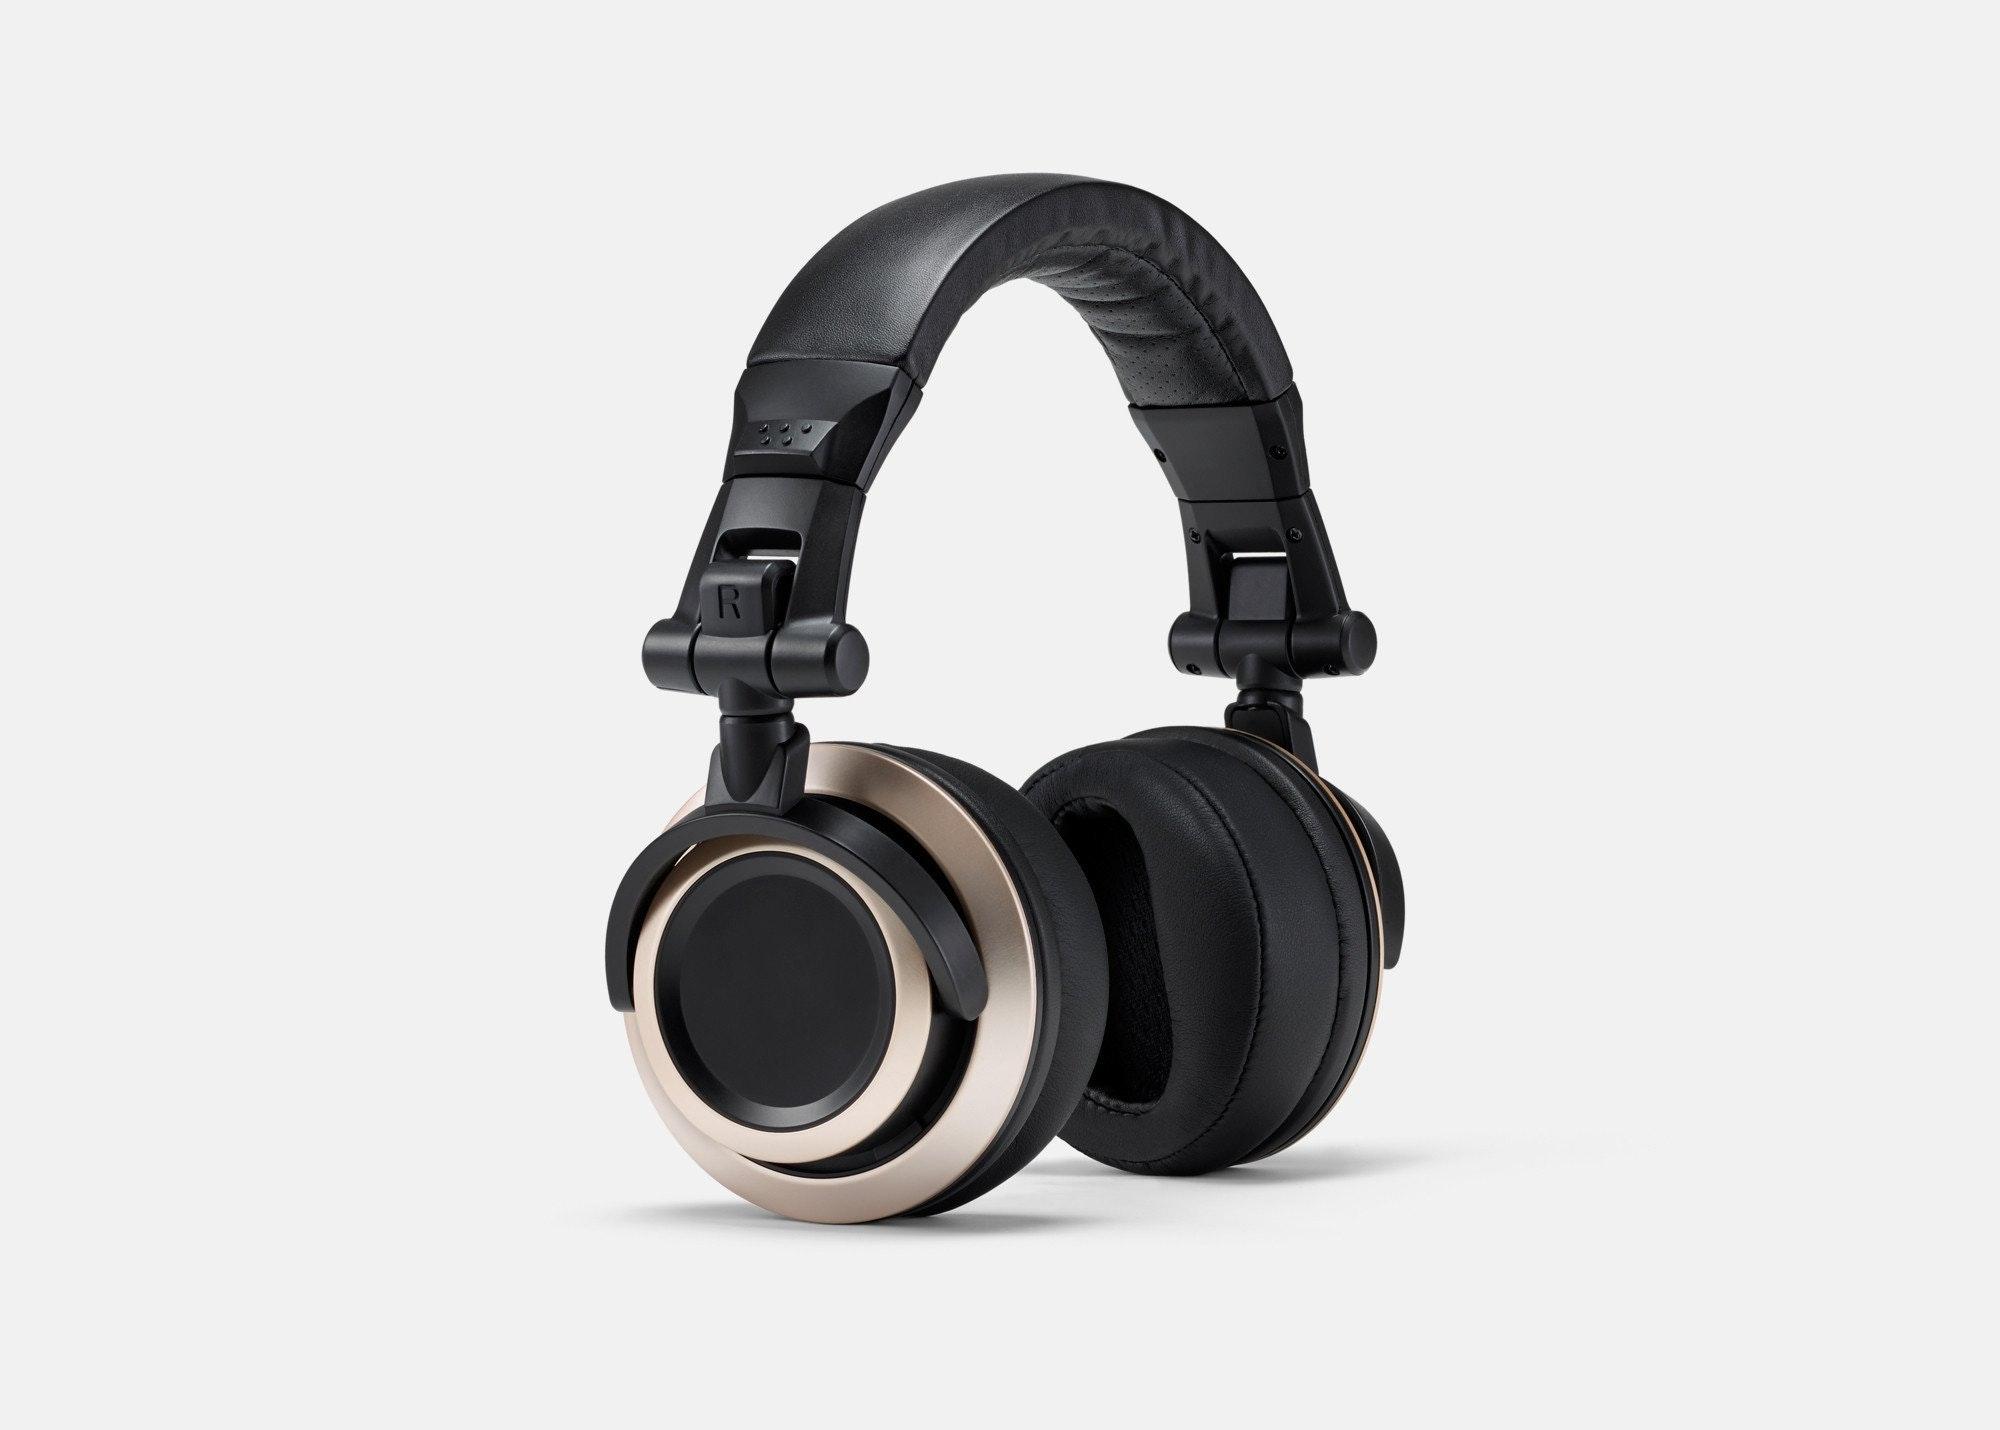 CB-1 Studio Headphones